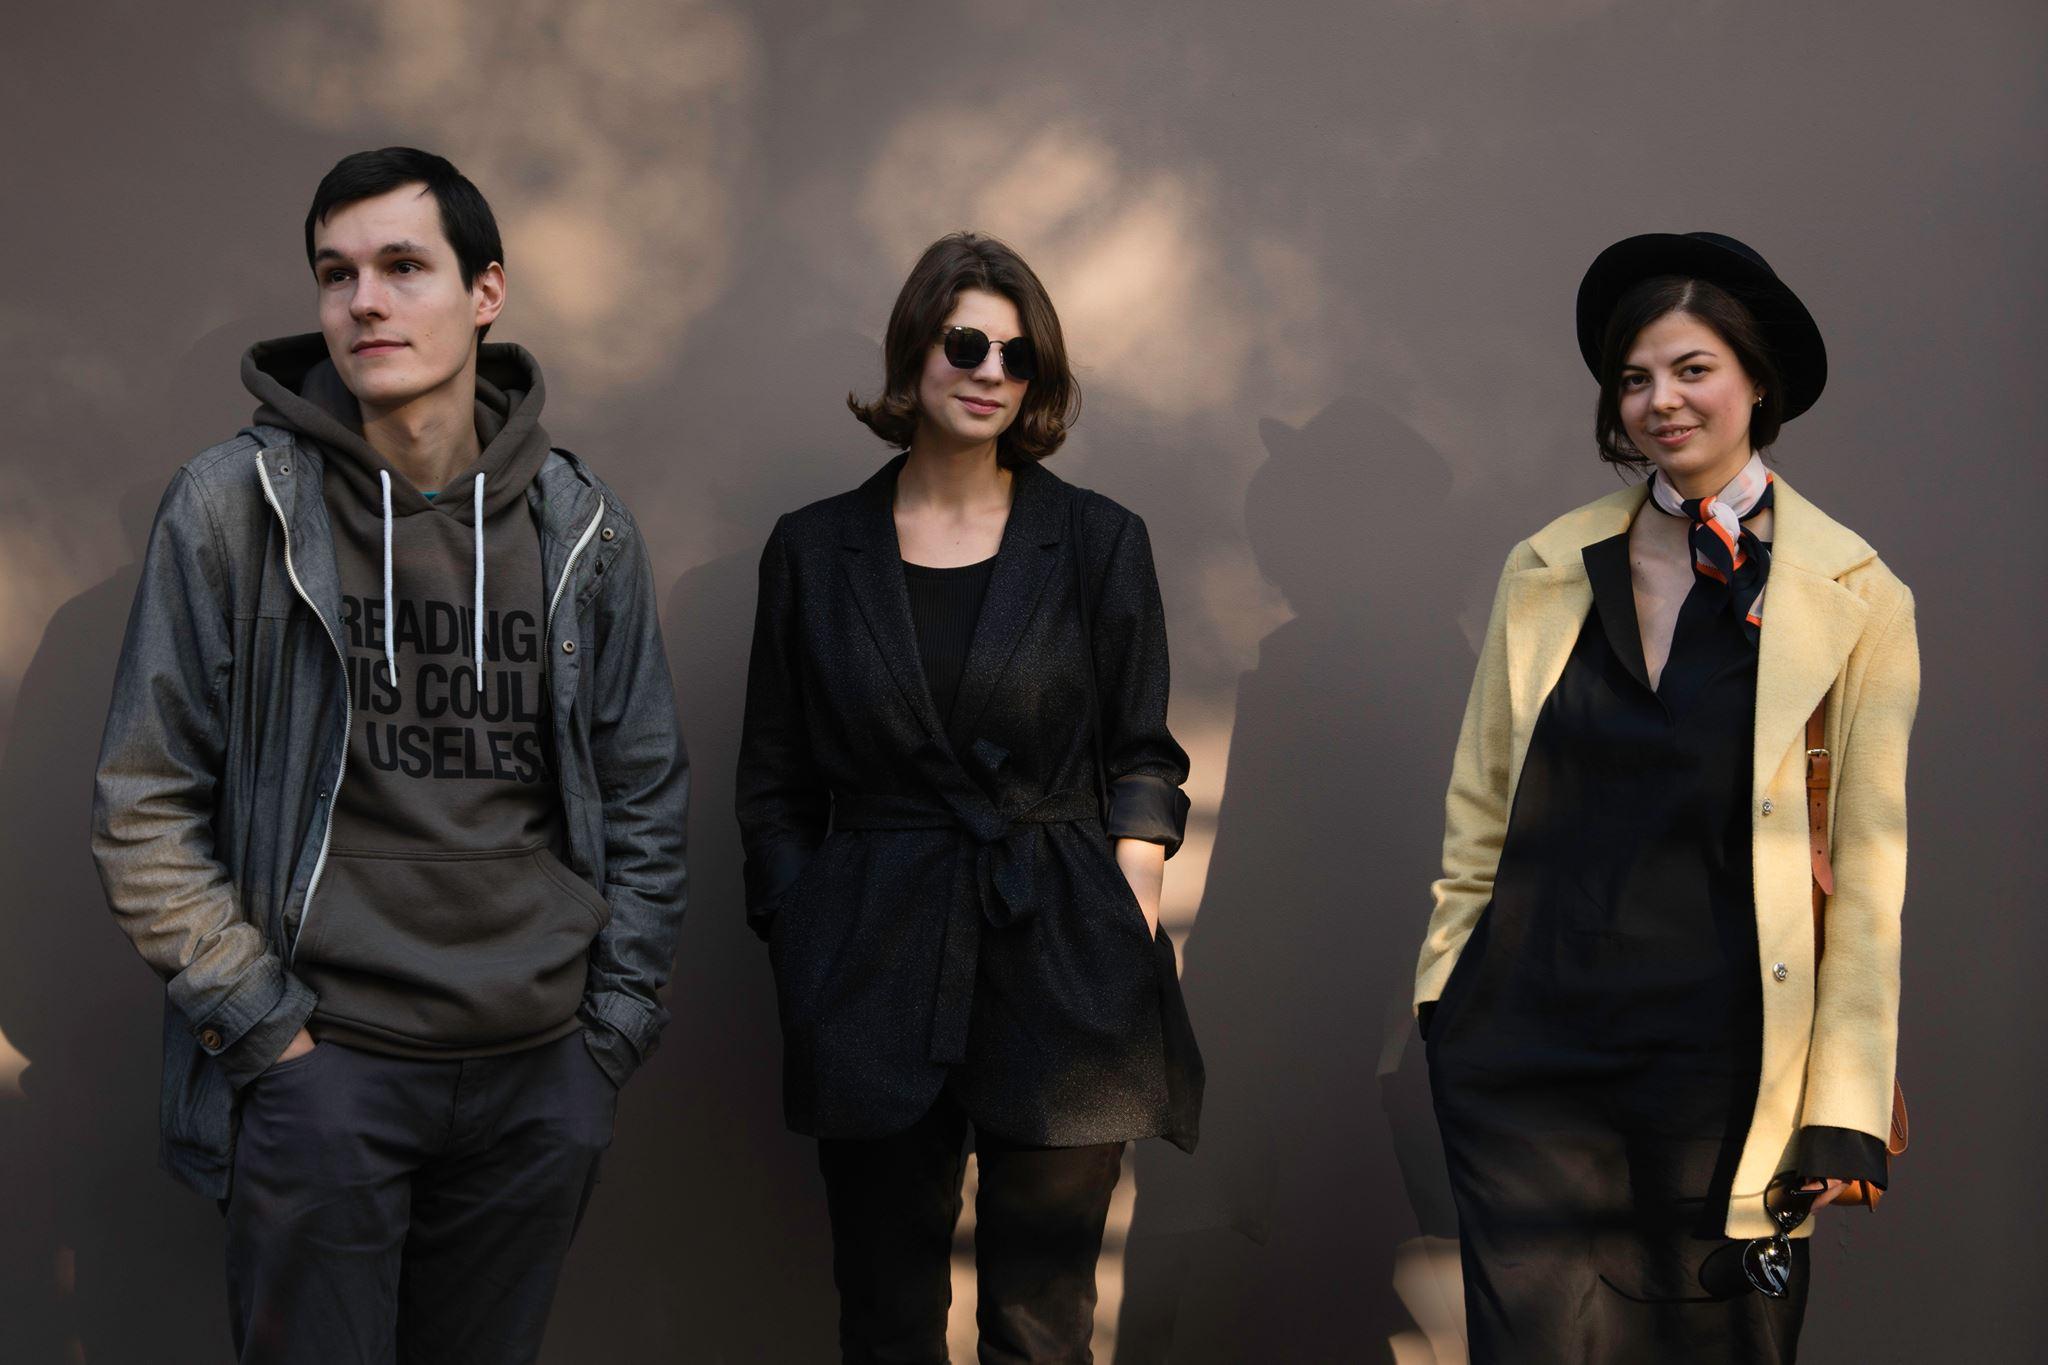 Борис Філоненко, Анастасія Леонова, Катерина Носко, співзасновники та редактори IST Publishing